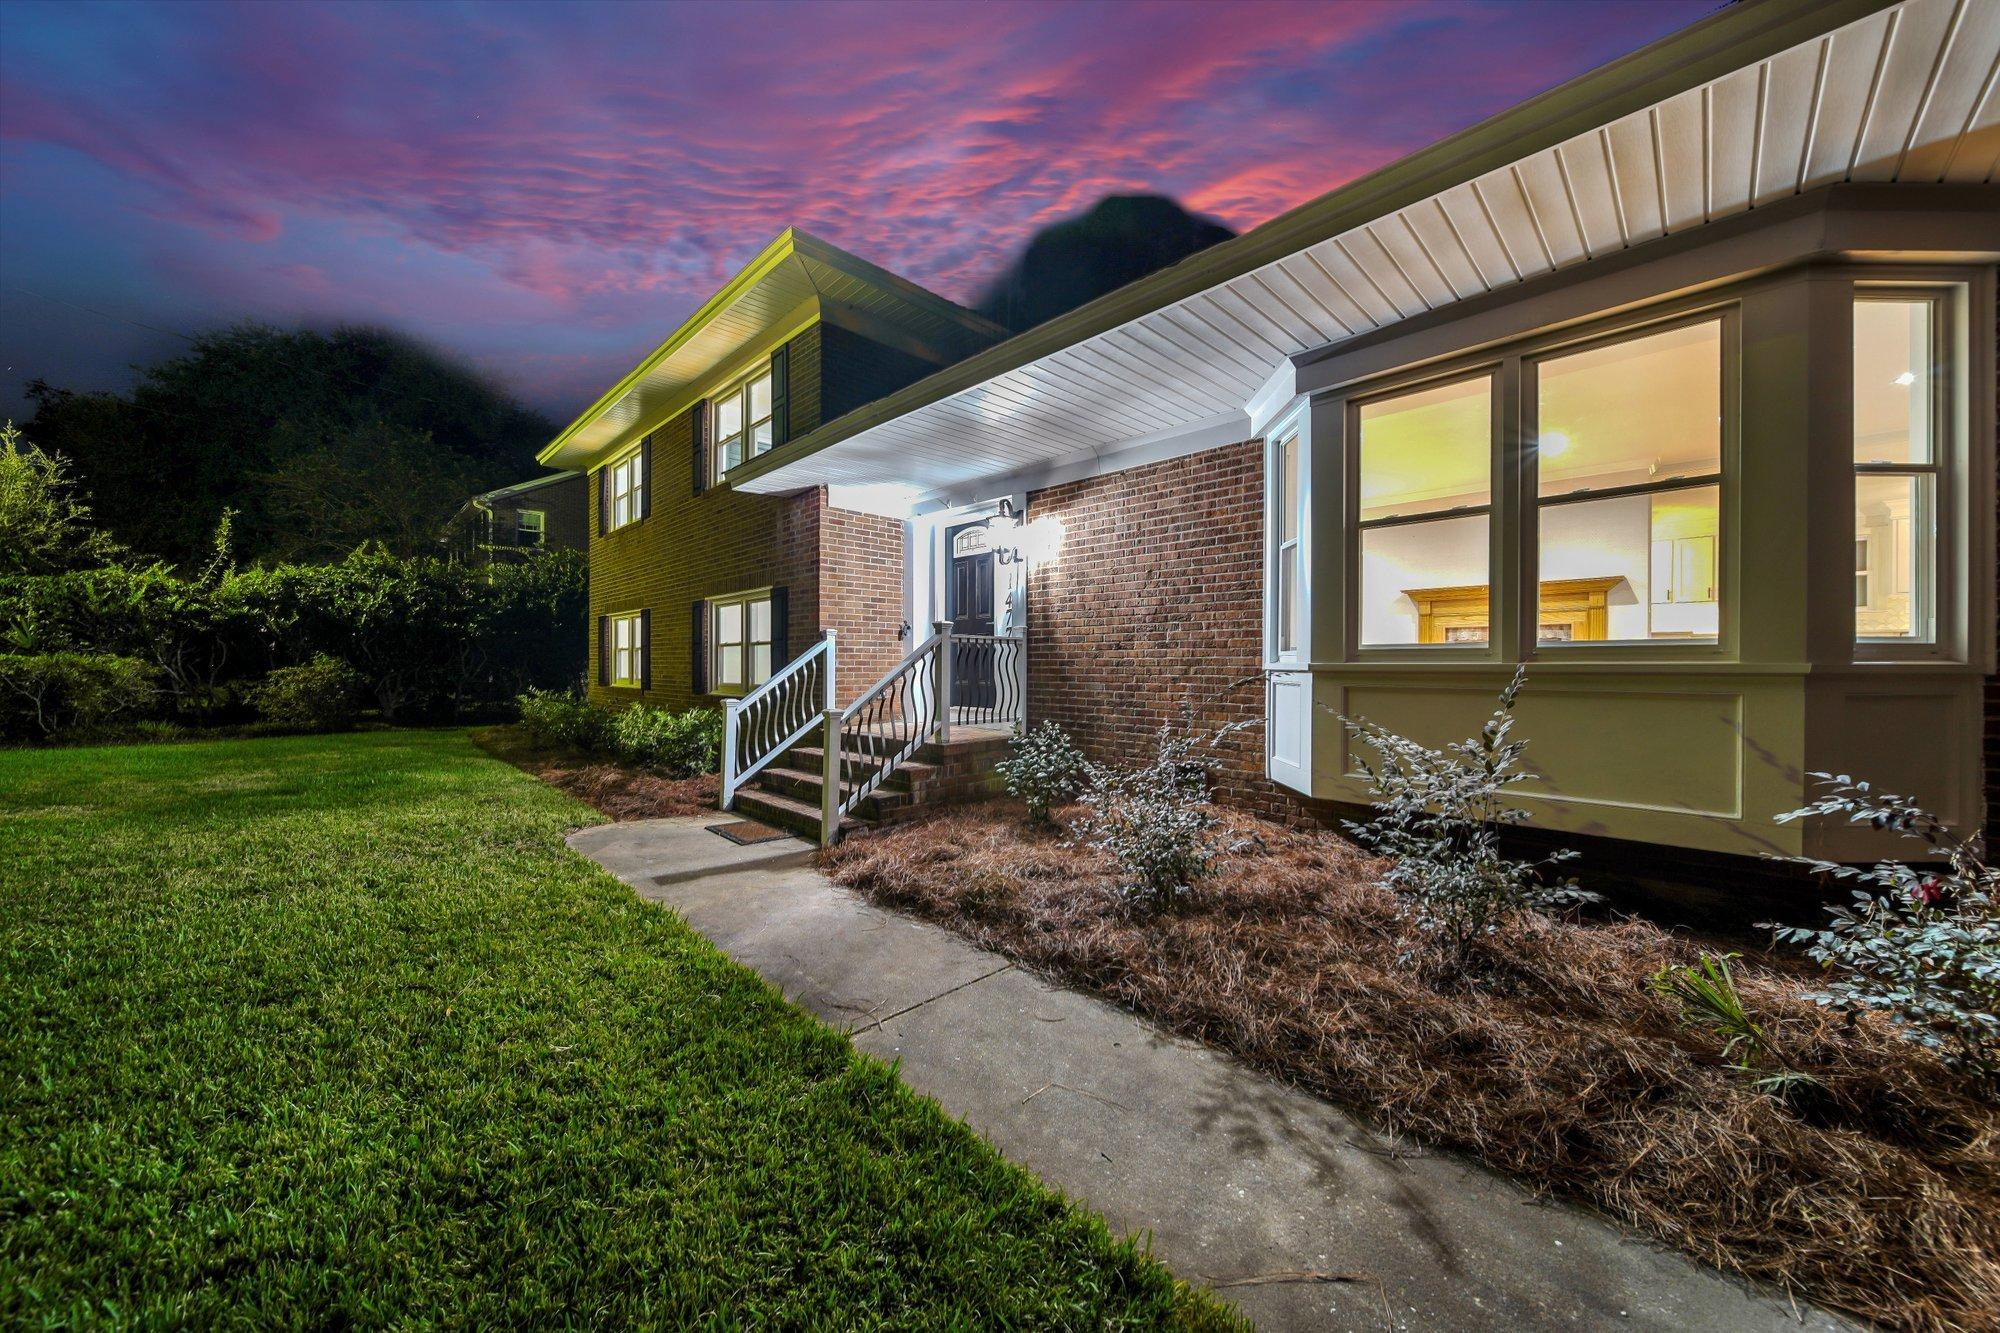 Country Club II Homes For Sale - 1477 Burningtree, Charleston, SC - 16